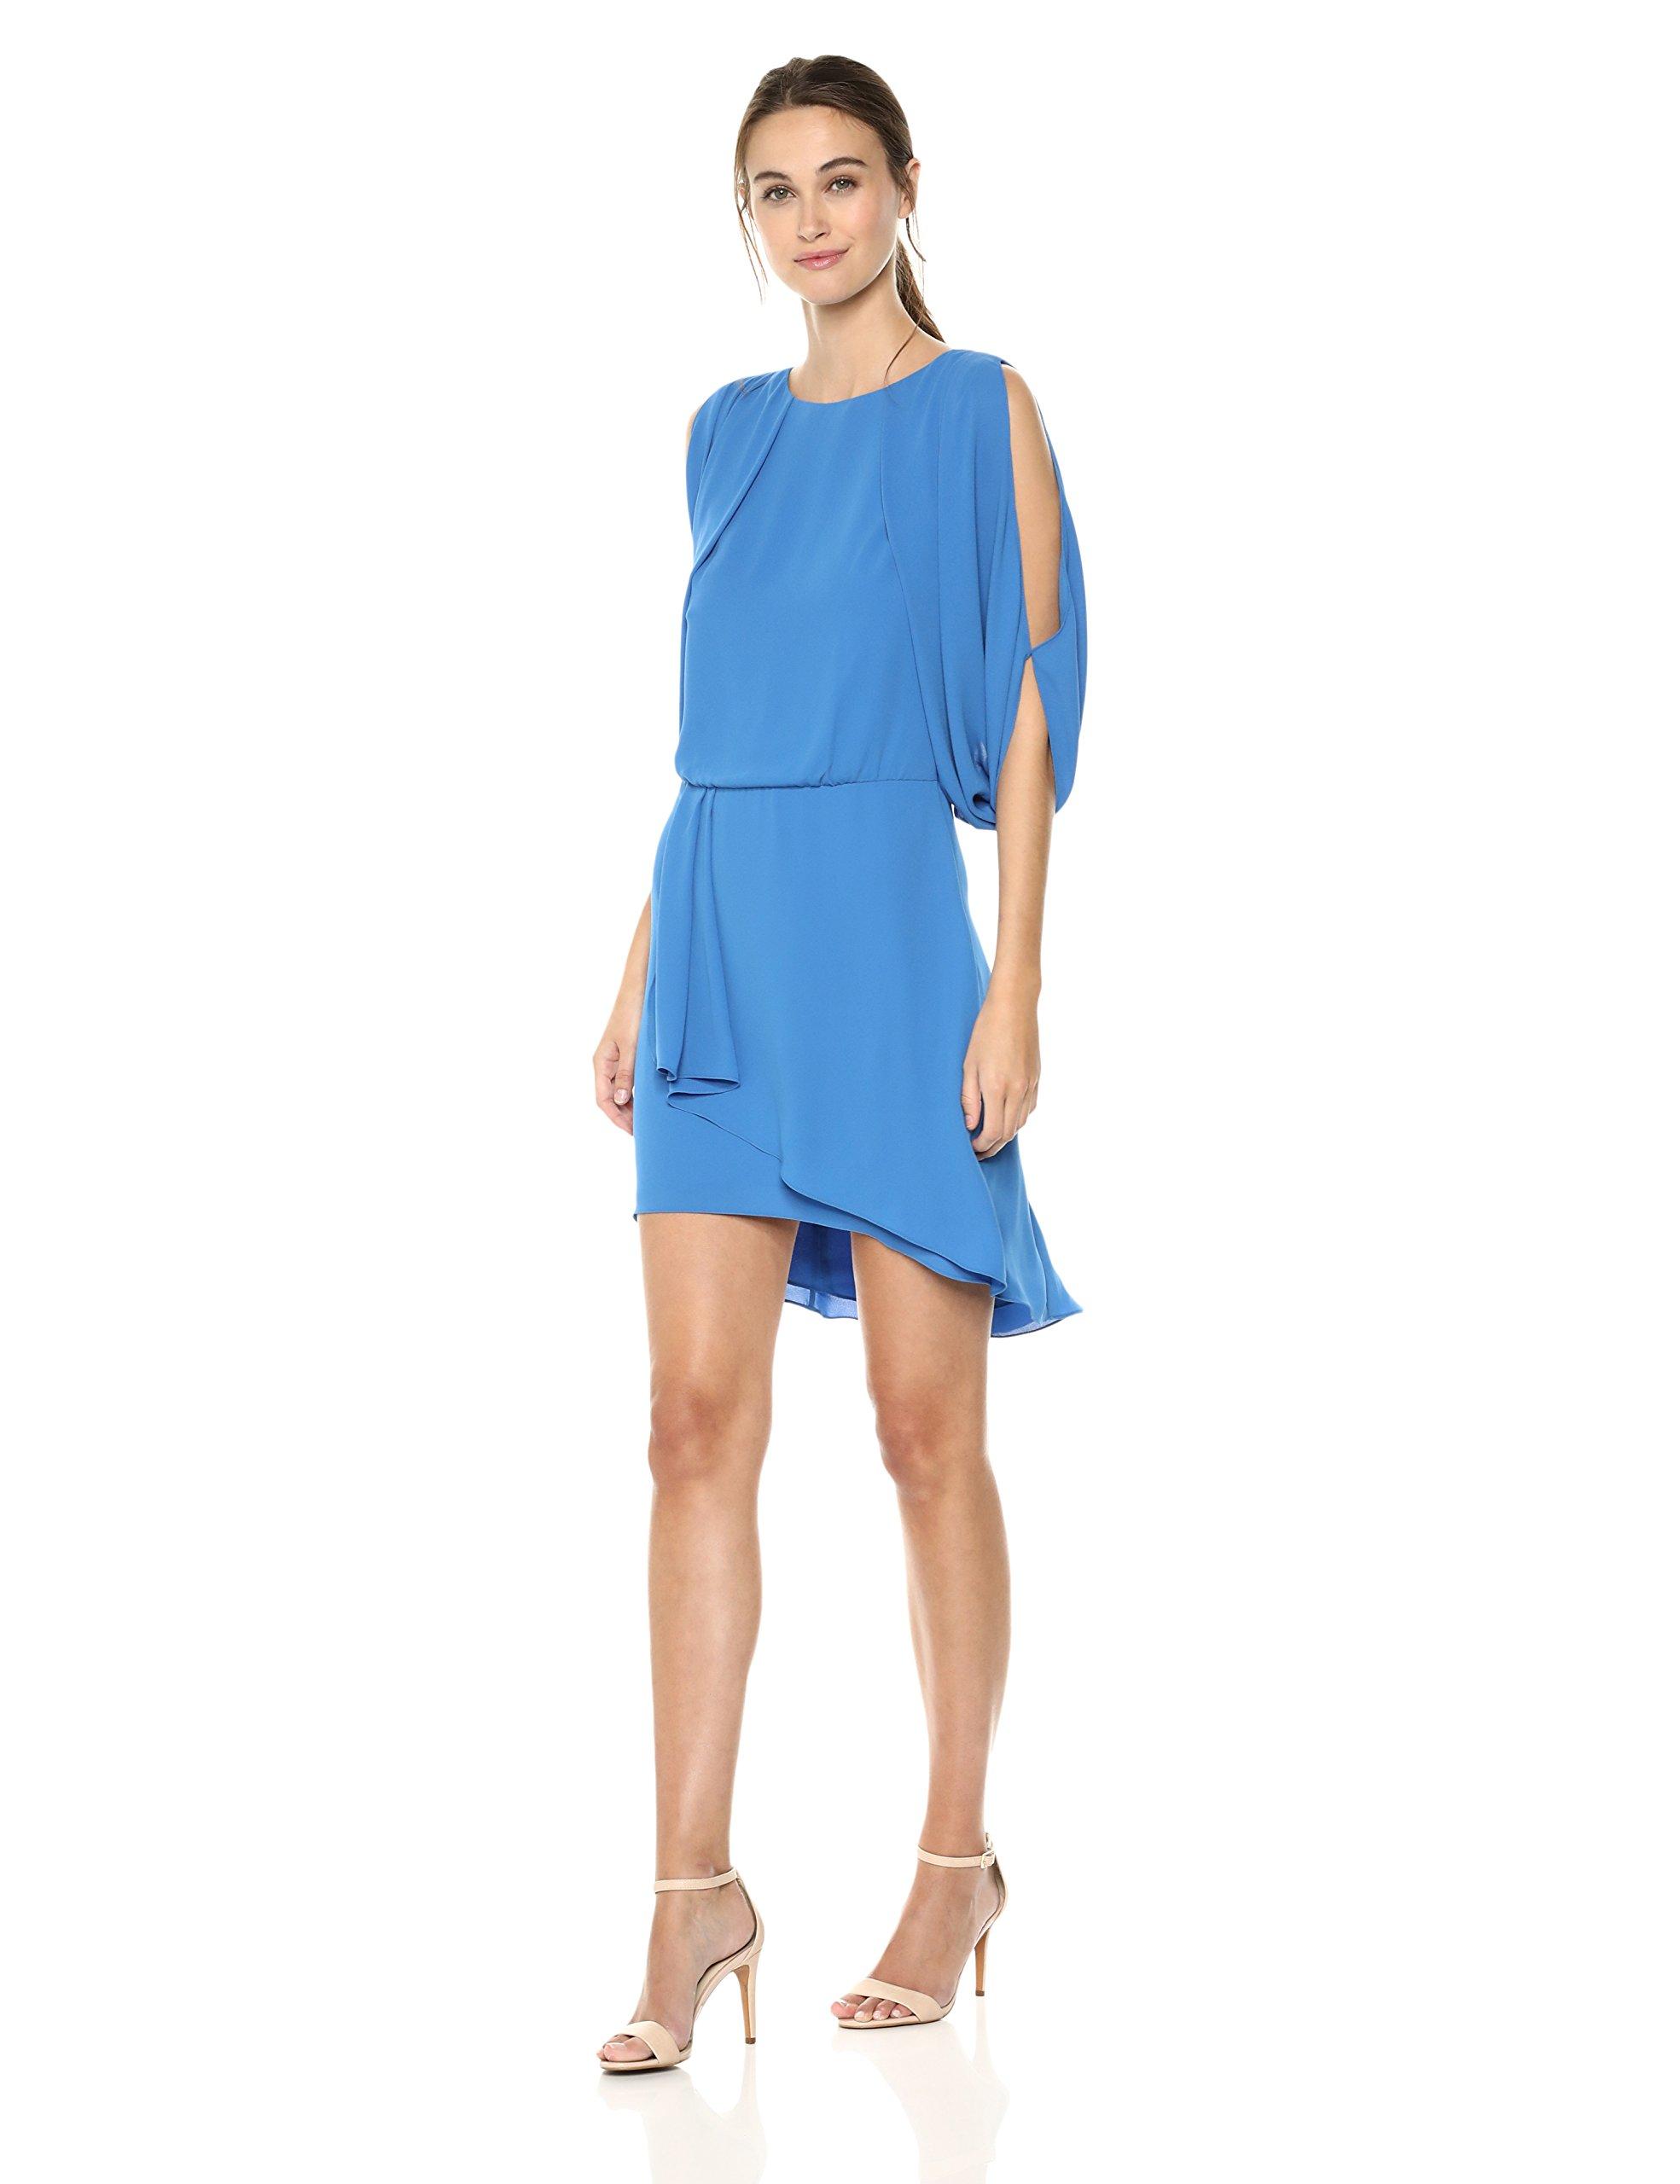 Available at Amazon: Halston Heritage Women's Cape Sleeve Draped Open Back Dress